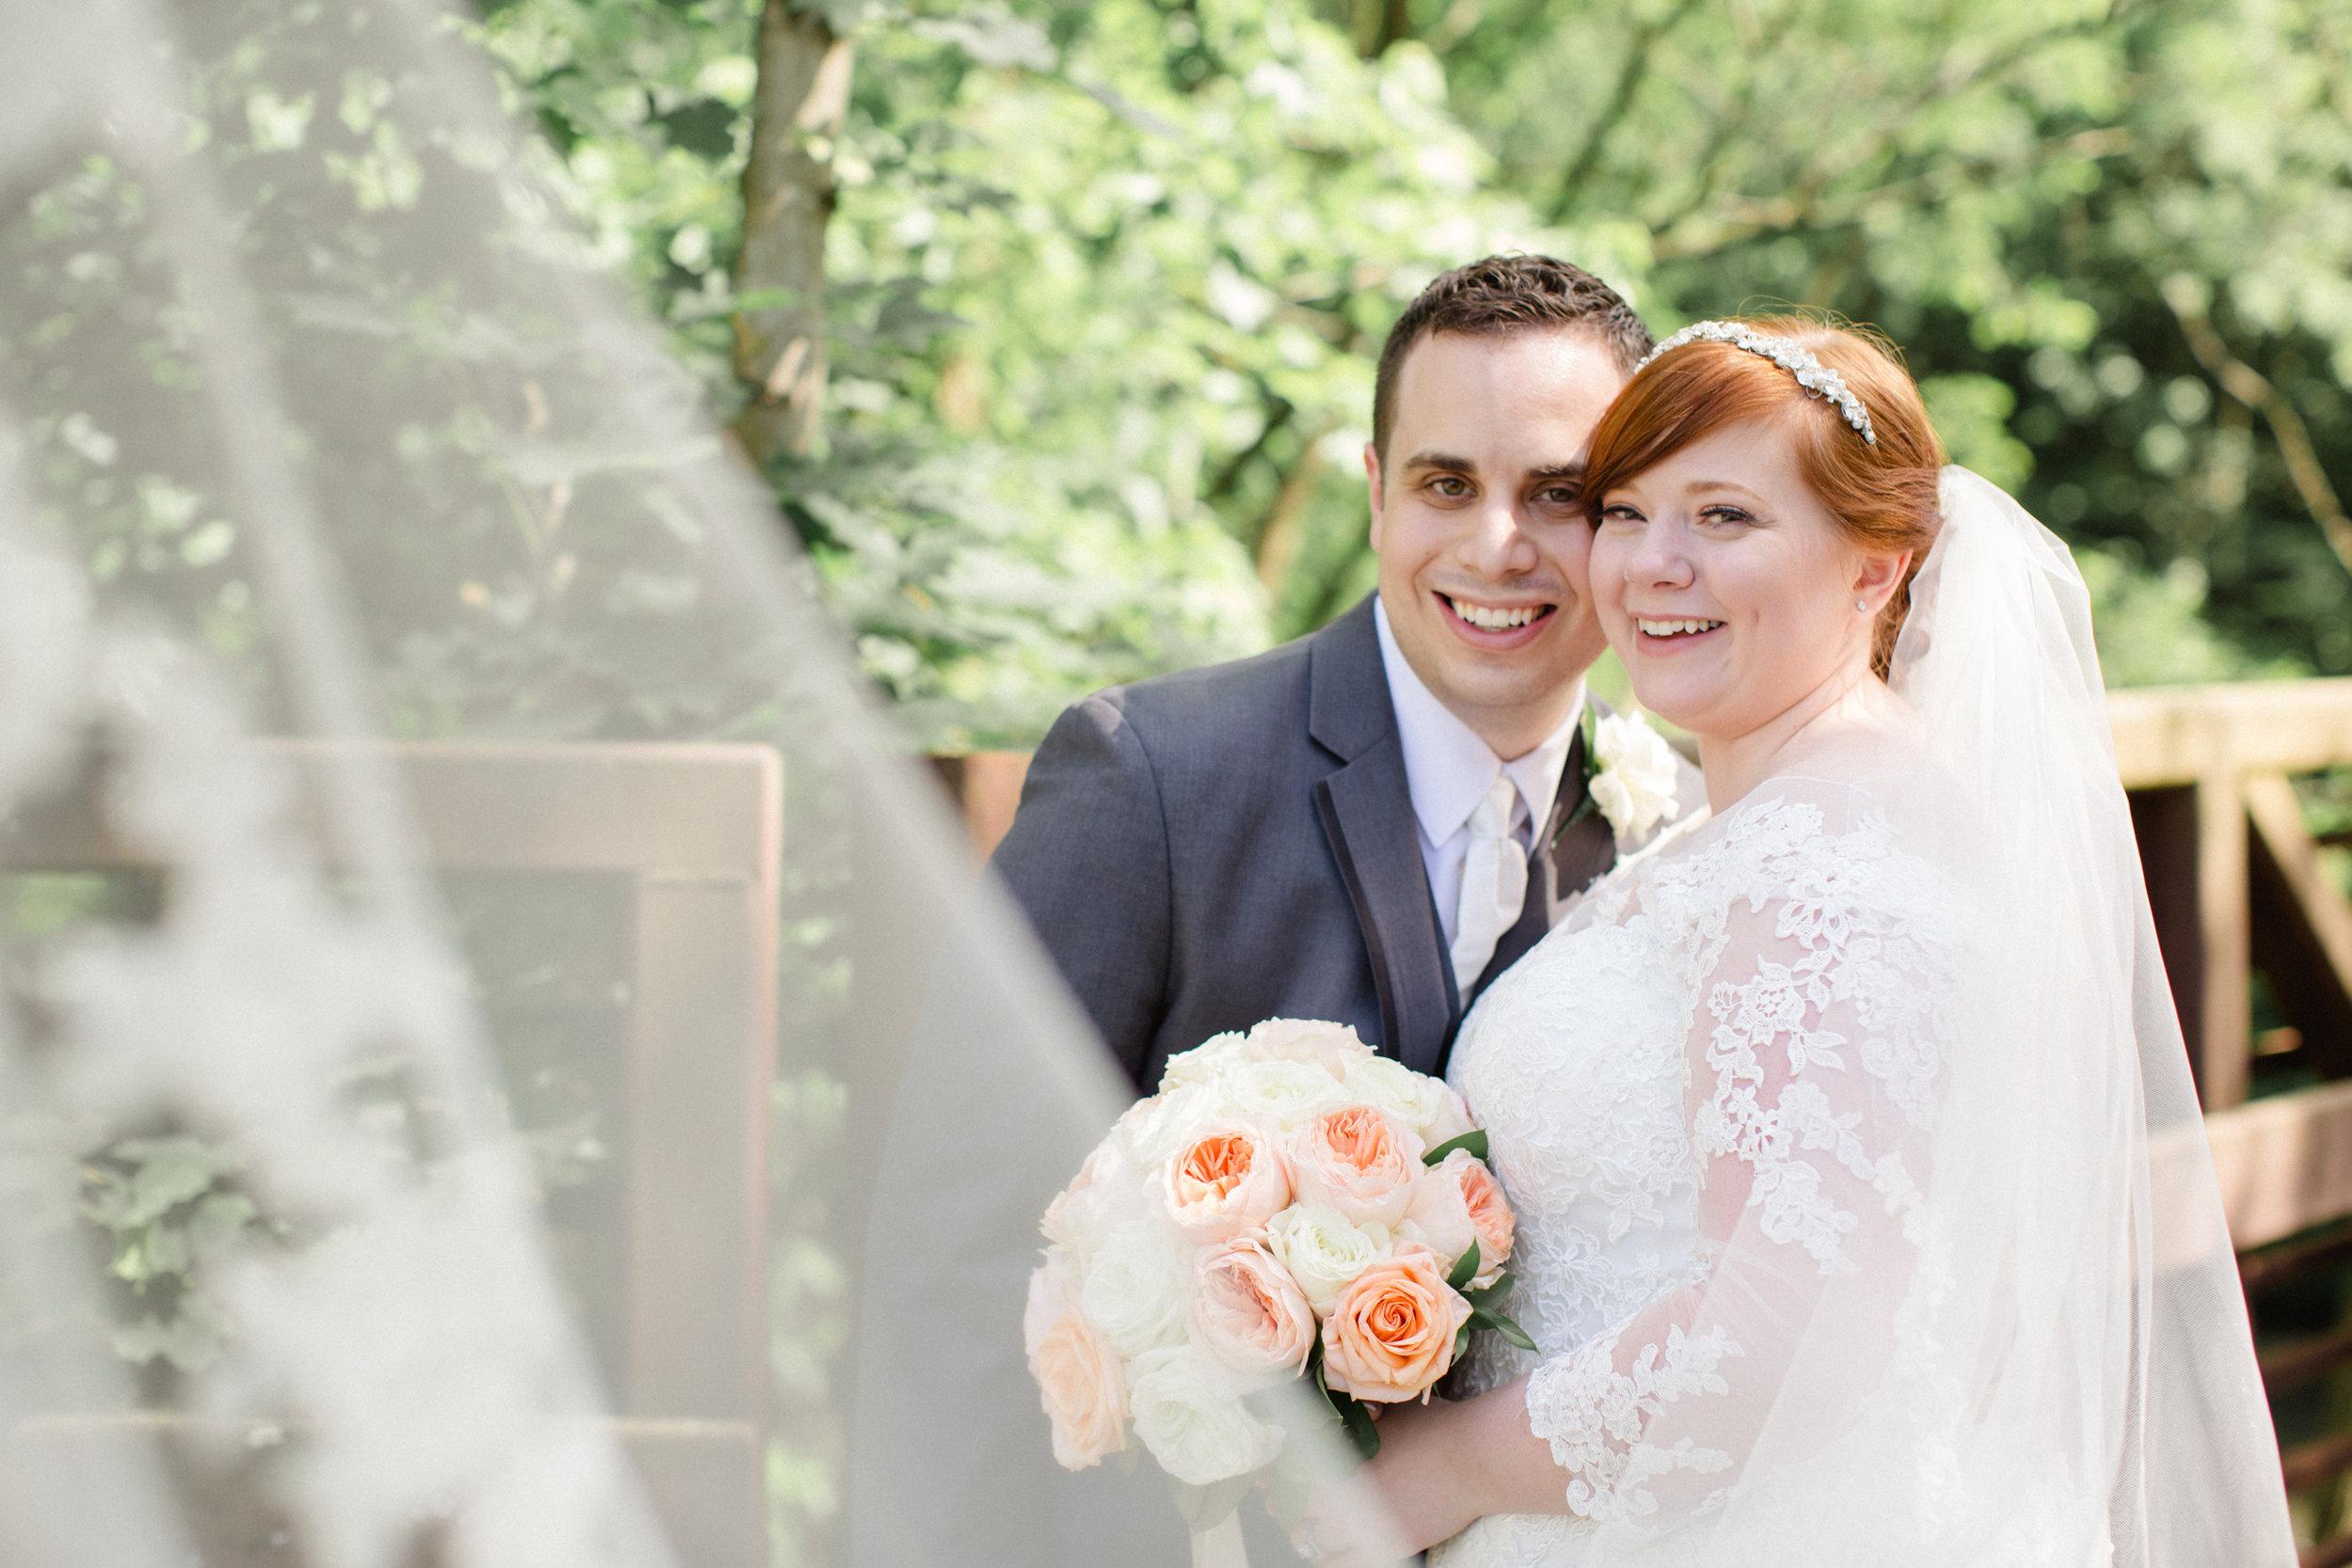 Fiorellis Wedding Photos_JDP-94.jpg